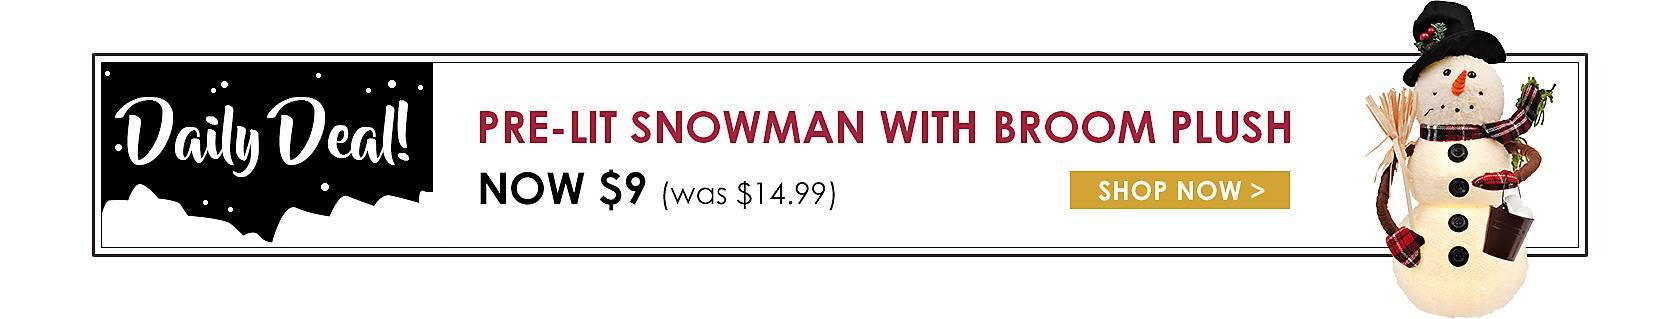 Daily Deals - Pre-Lit Snowman with Broom Plush Now $9 - Shop Now